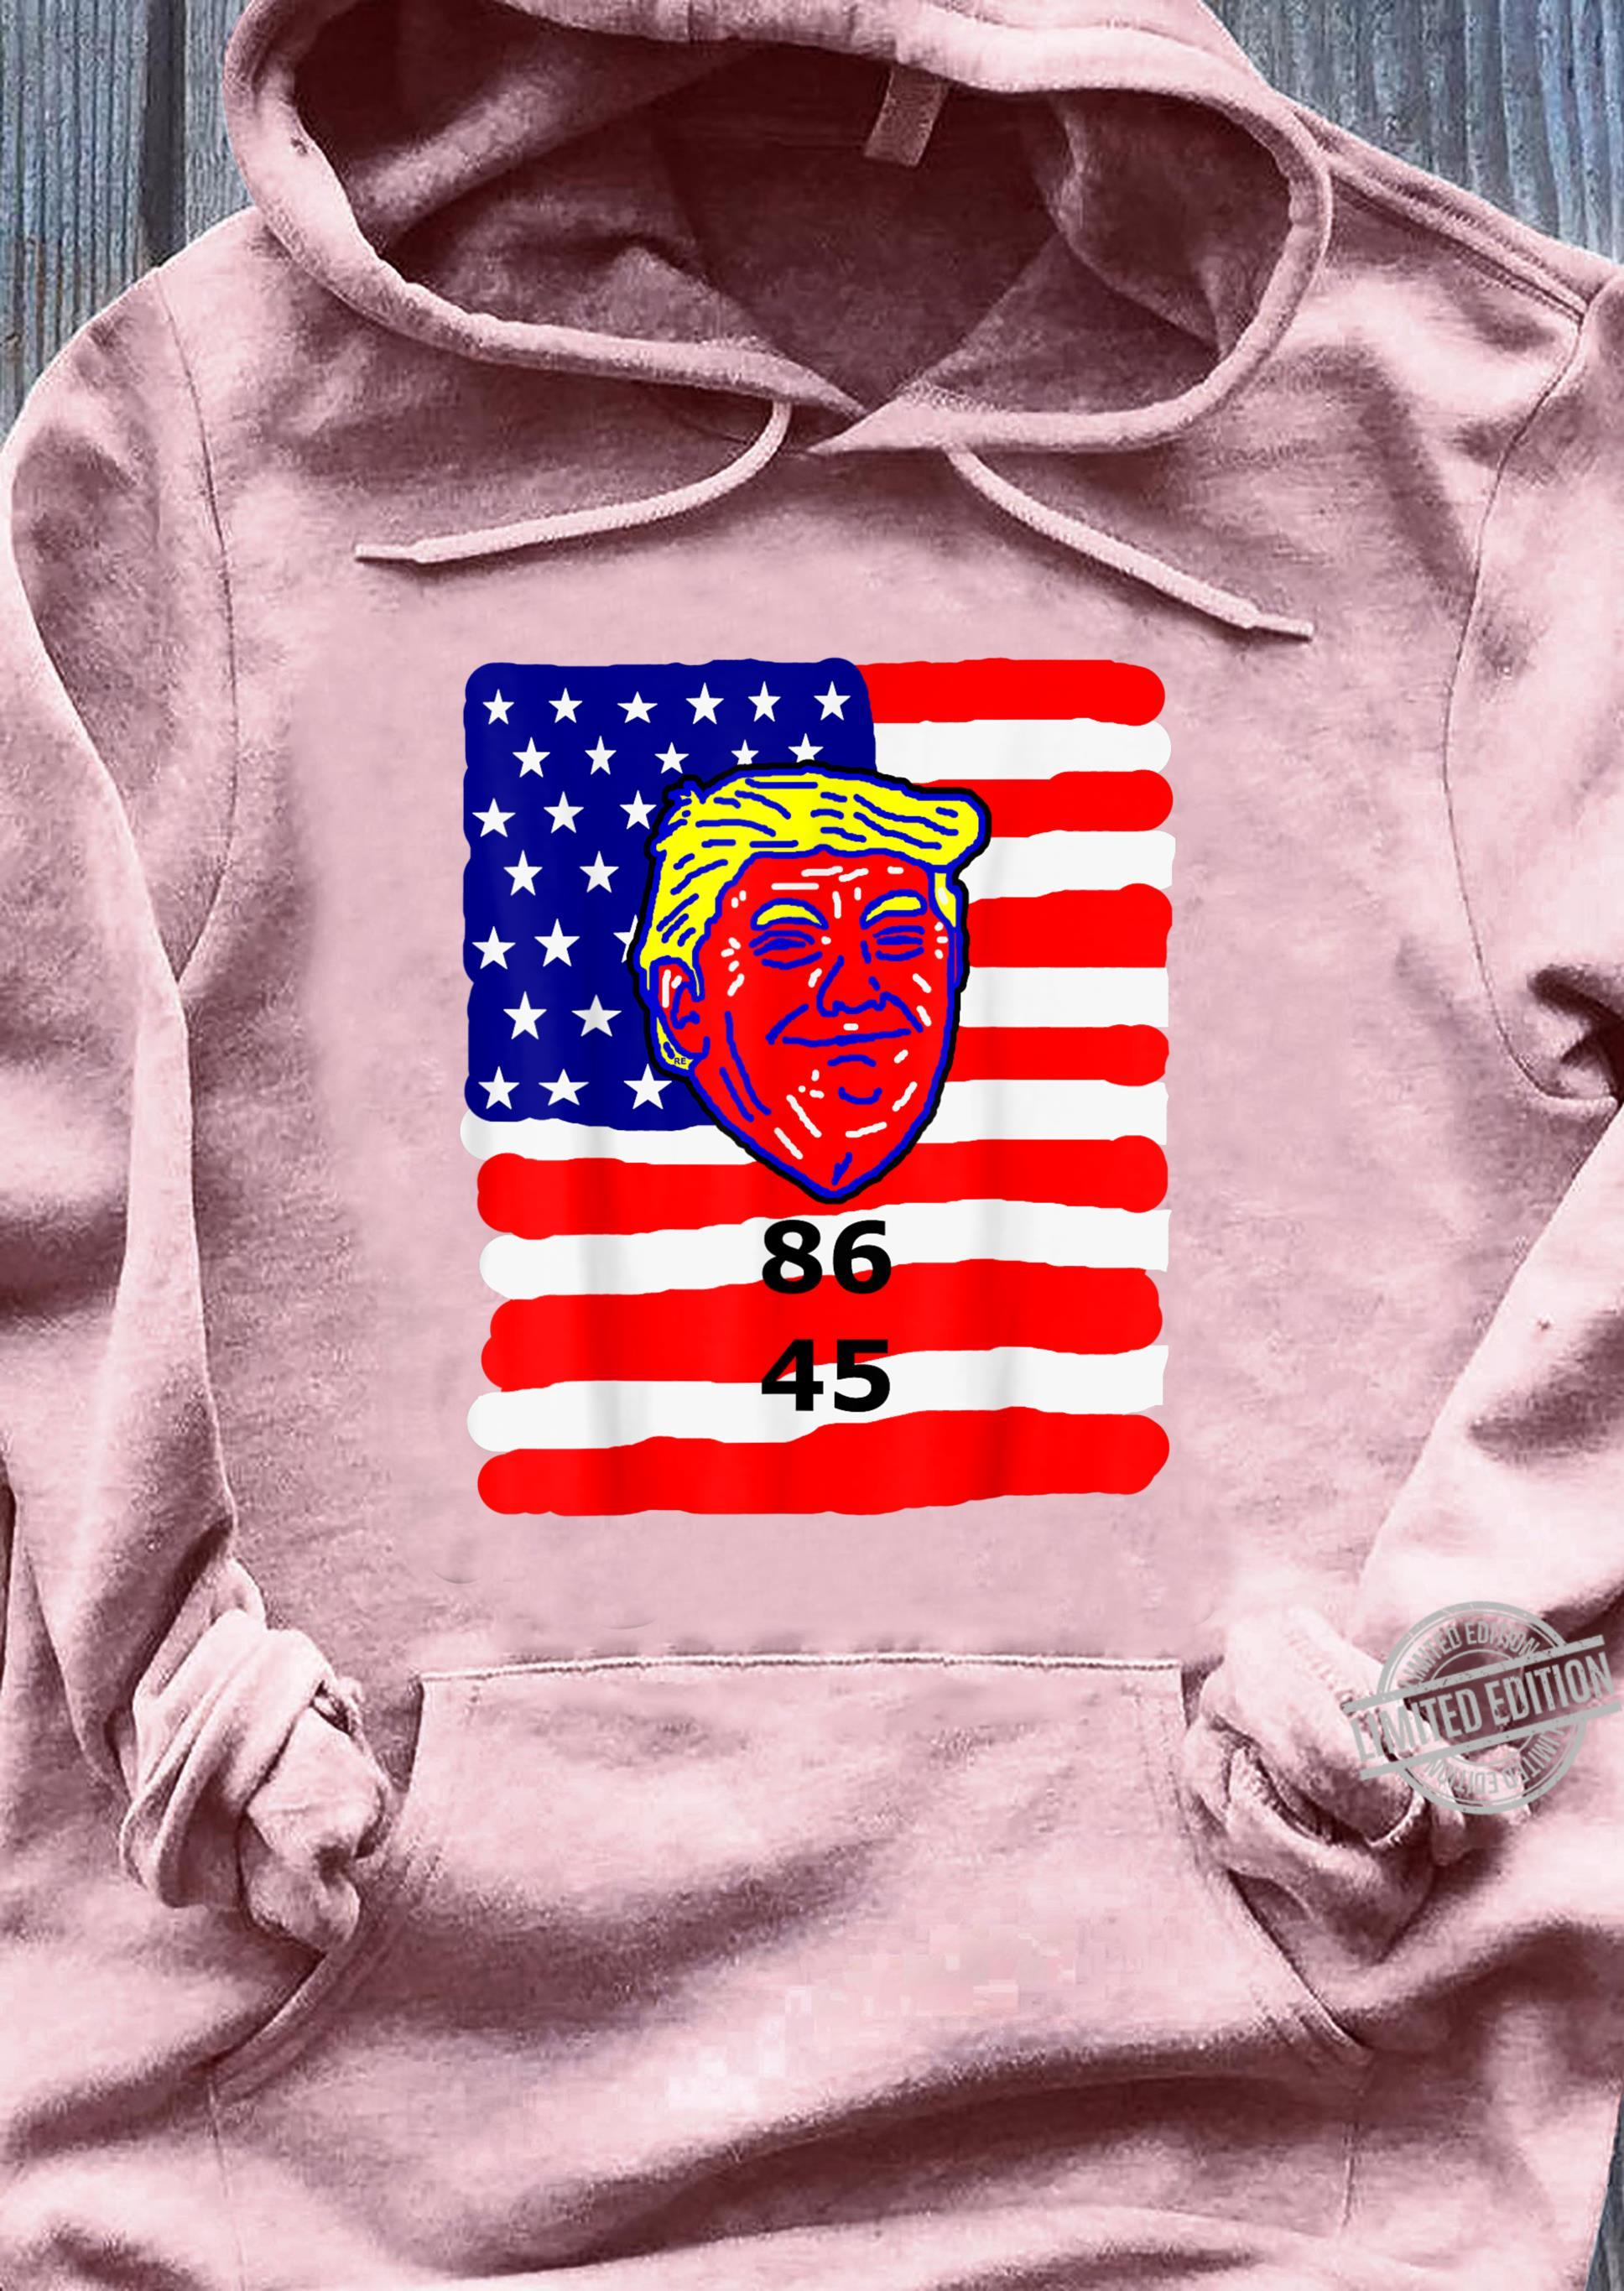 86 45 2020 Anti Donald Trump Shirt Impeach Trump 2020 Shirt sweater